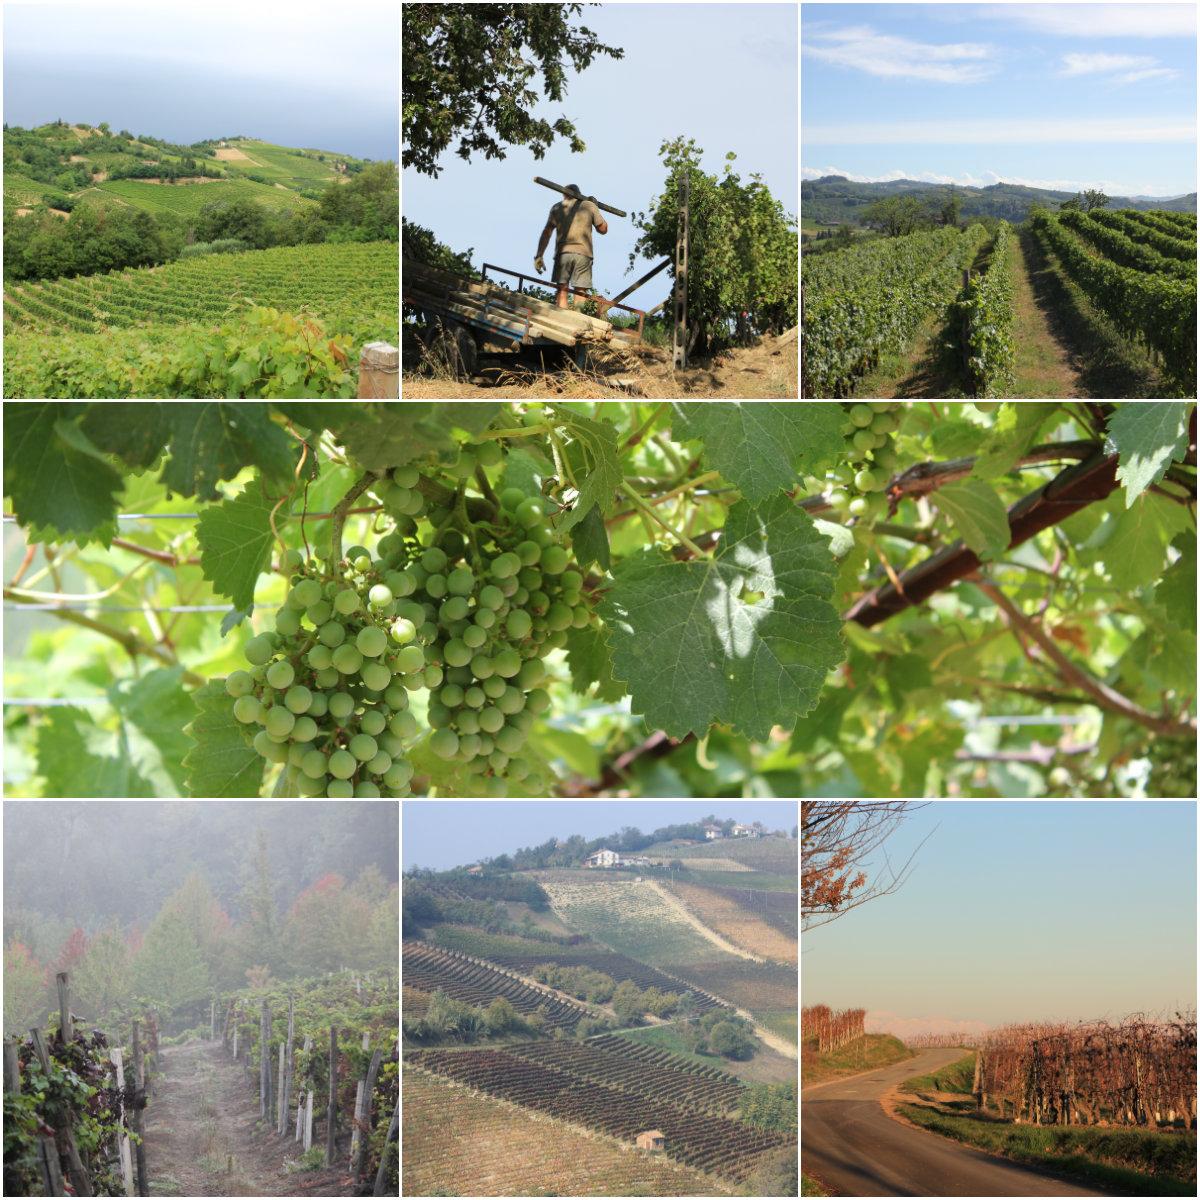 vinmarkene